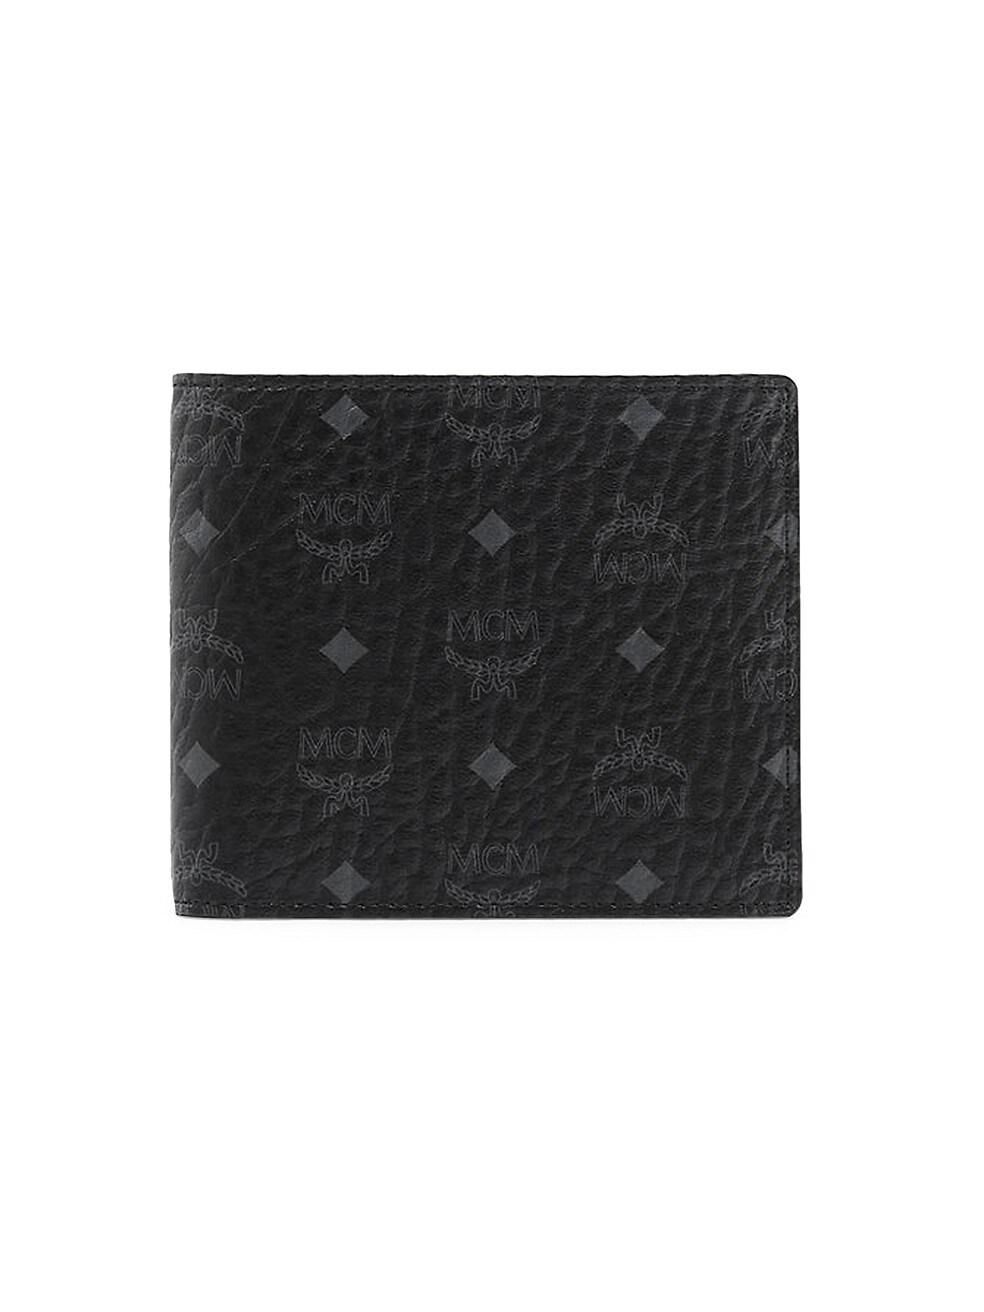 MCM Small Visetos Original Flap Bi-Fold Wallet,BLACK